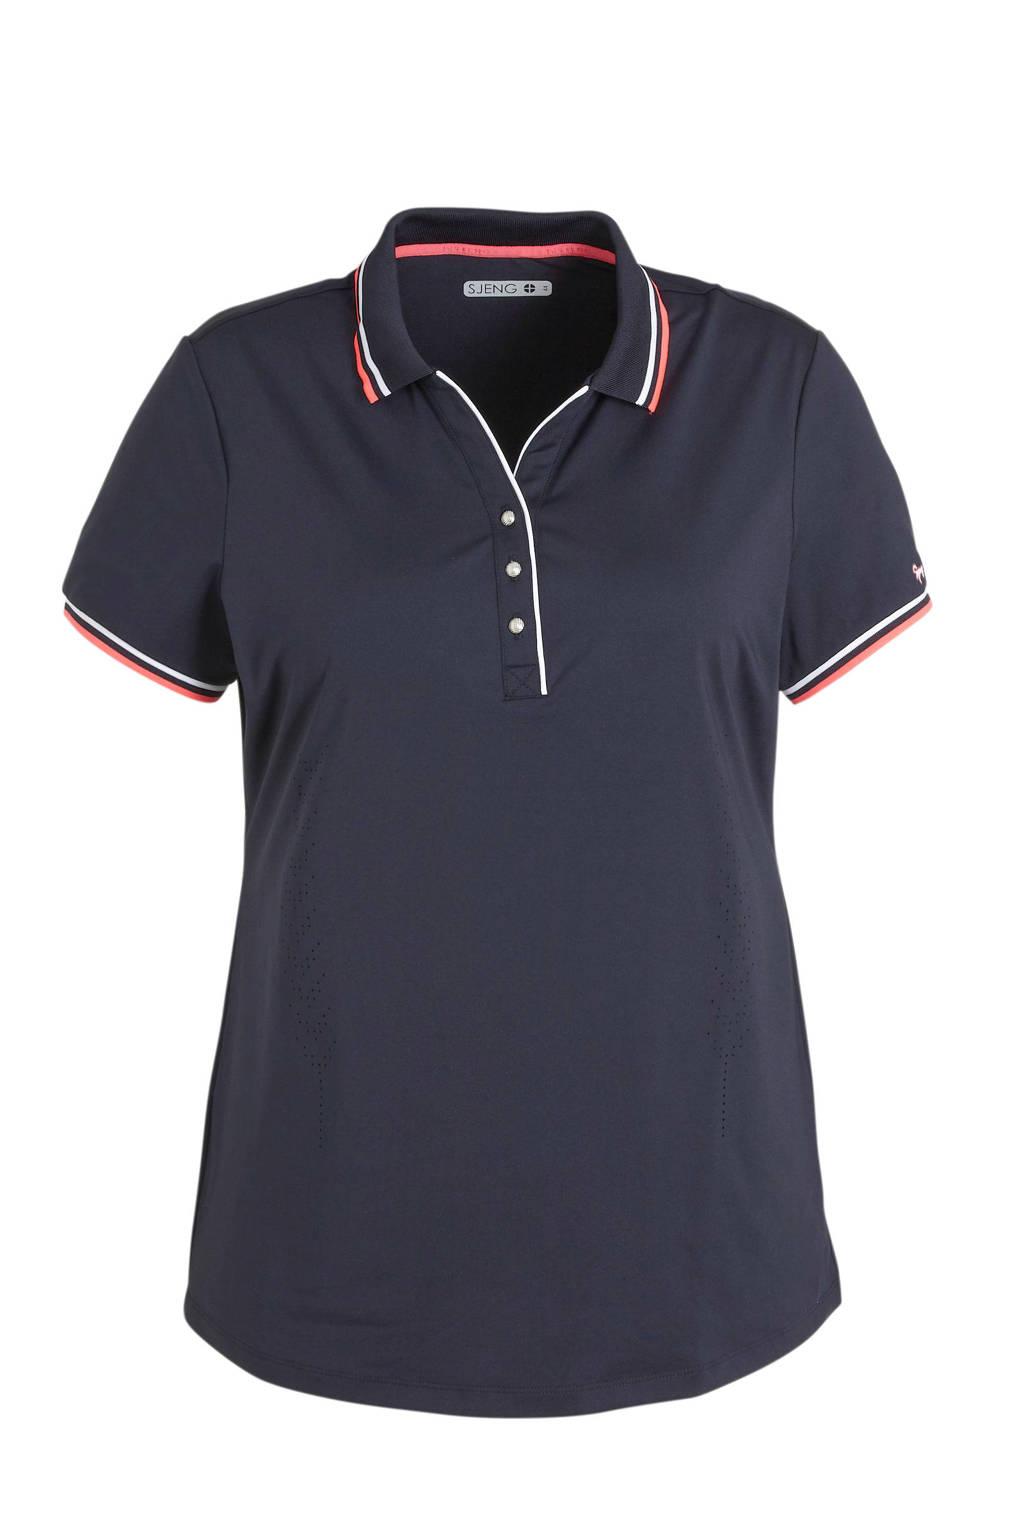 Sjeng Sports polo Robin Plus donkerblauw, Donkerblauw